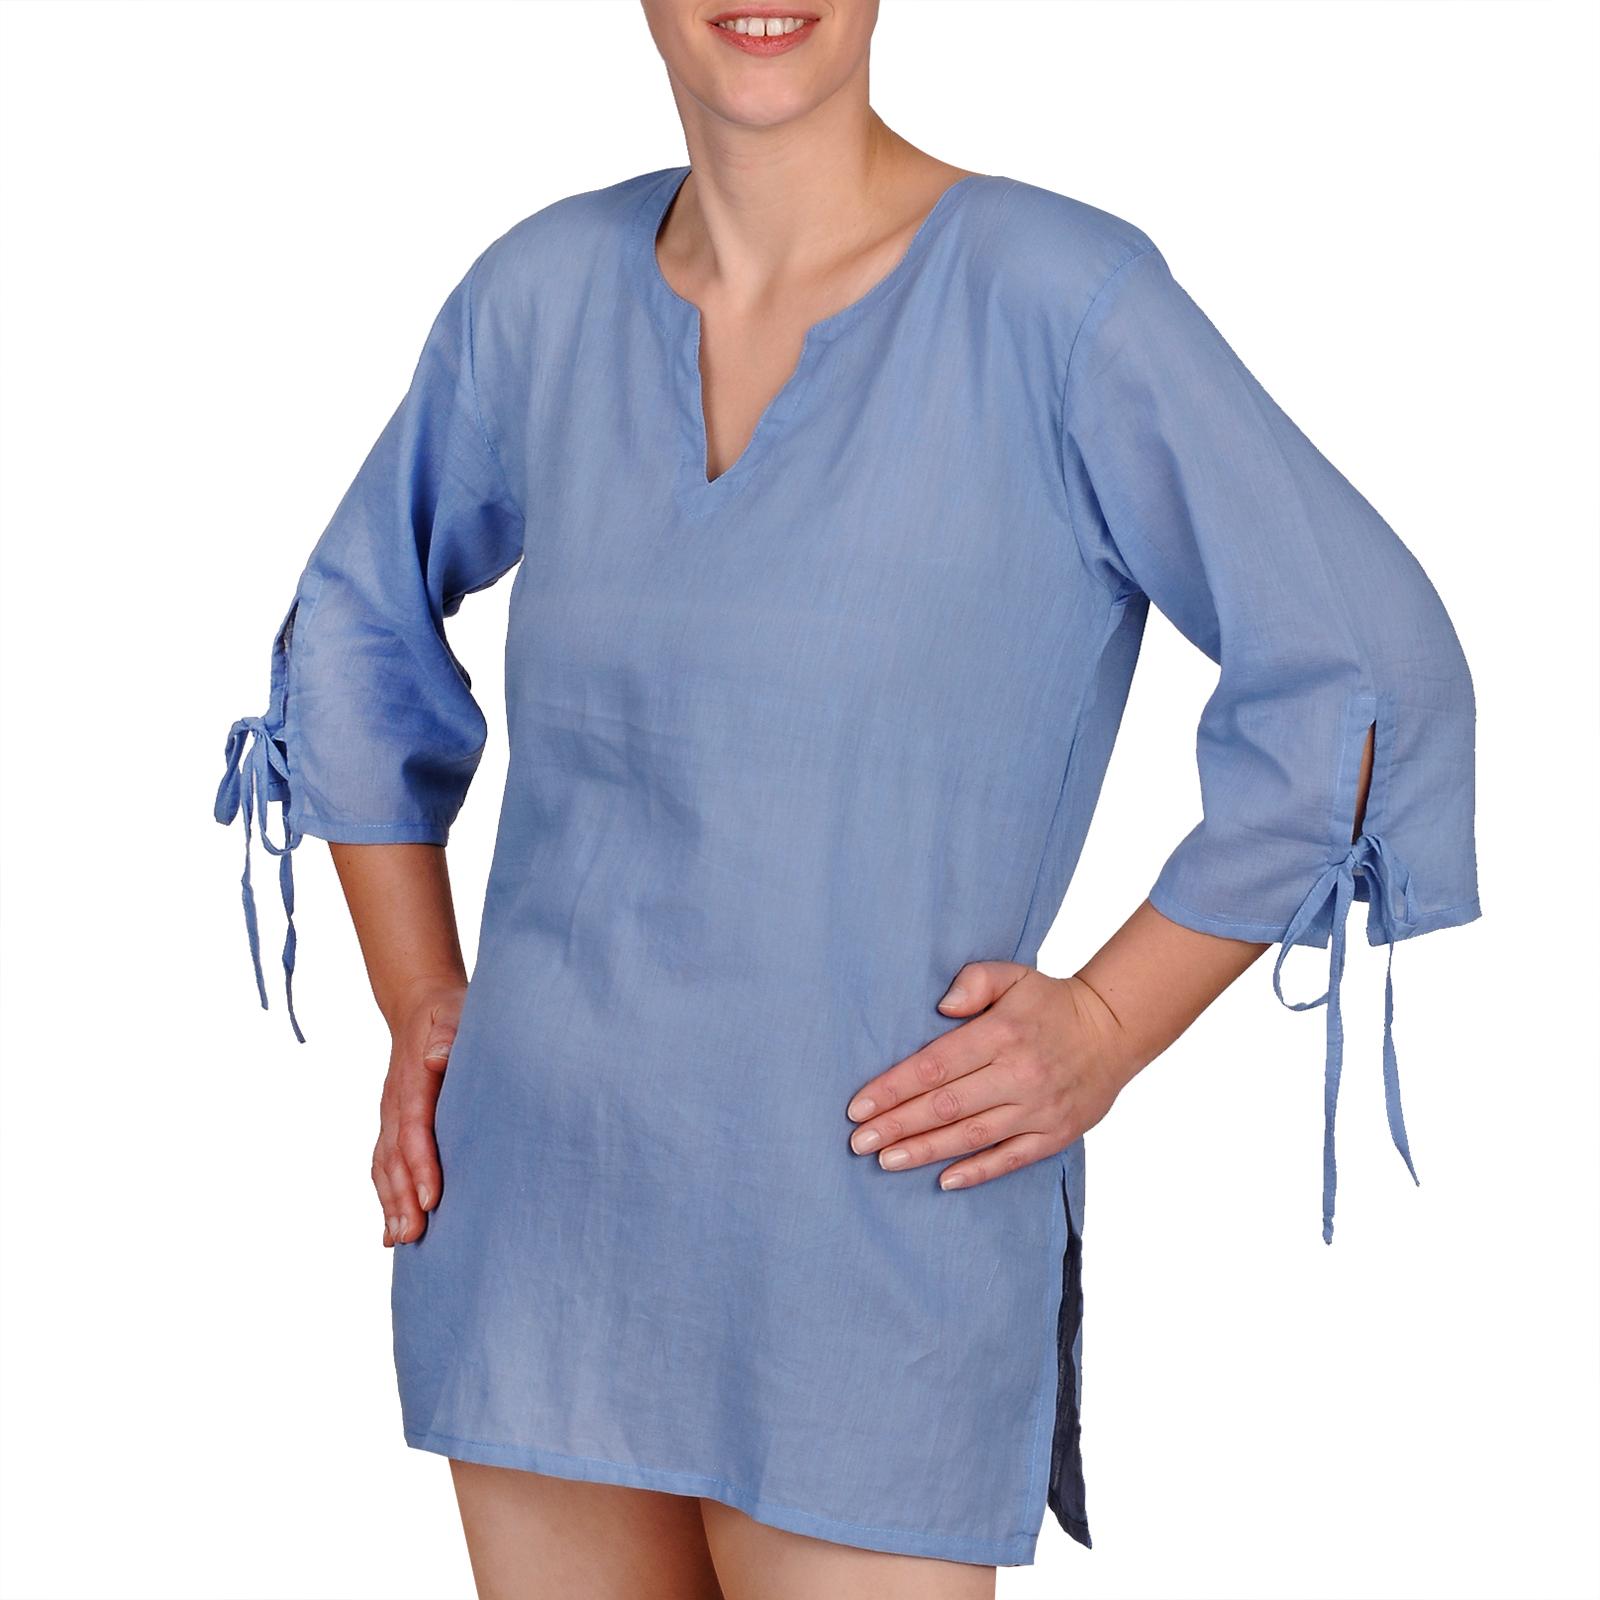 blouse-legere-coton-bleu-jean-AT-02453-V16